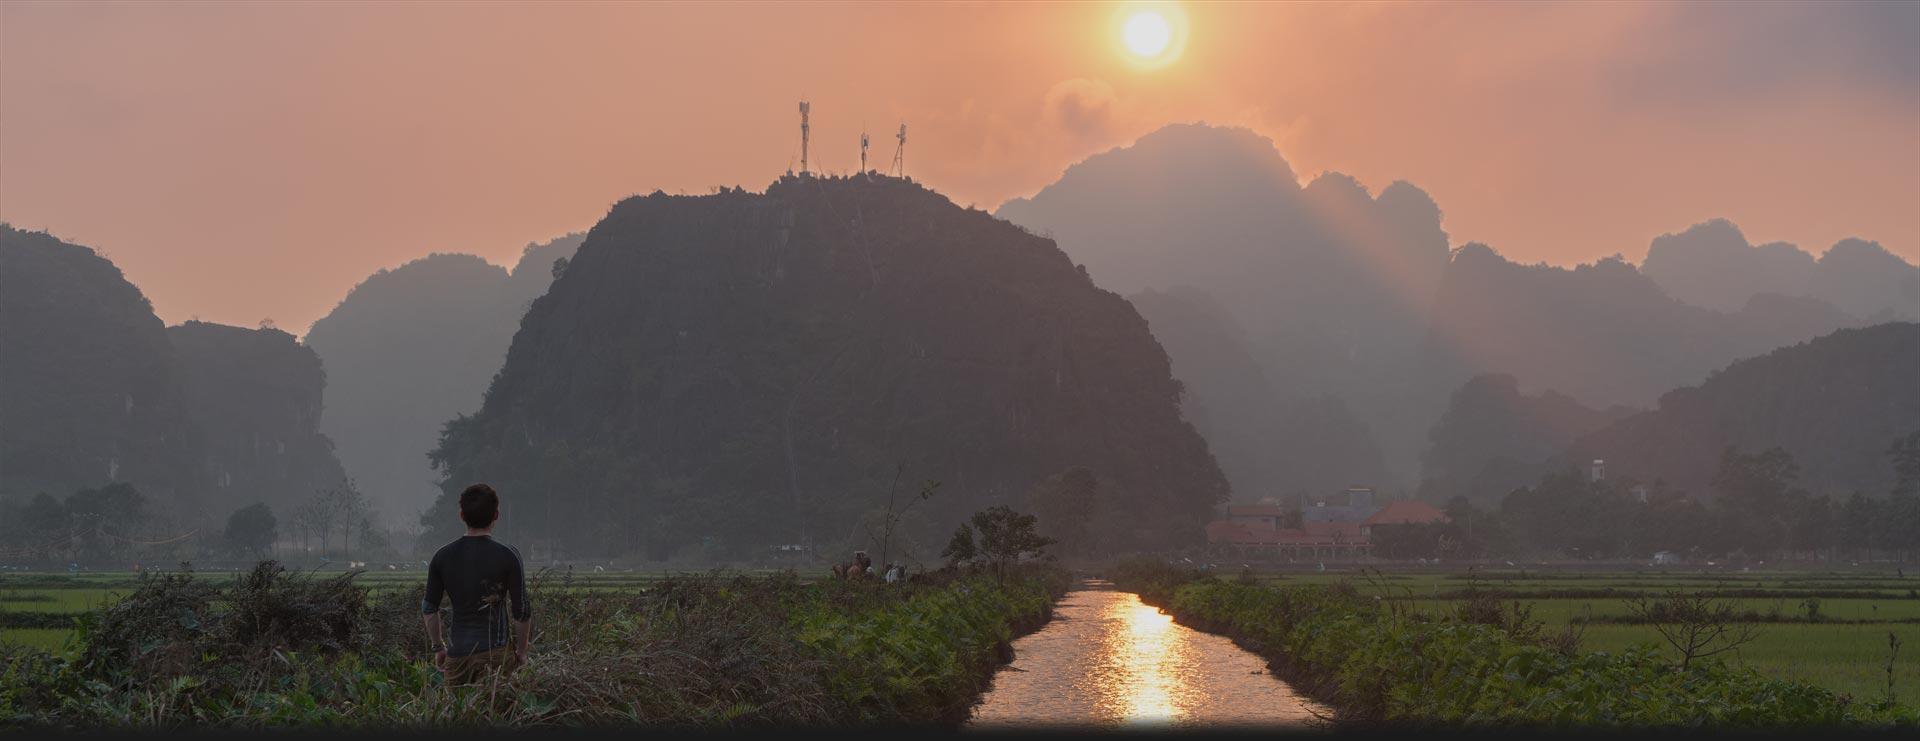 Vietnam — Dry Ha Long Bay